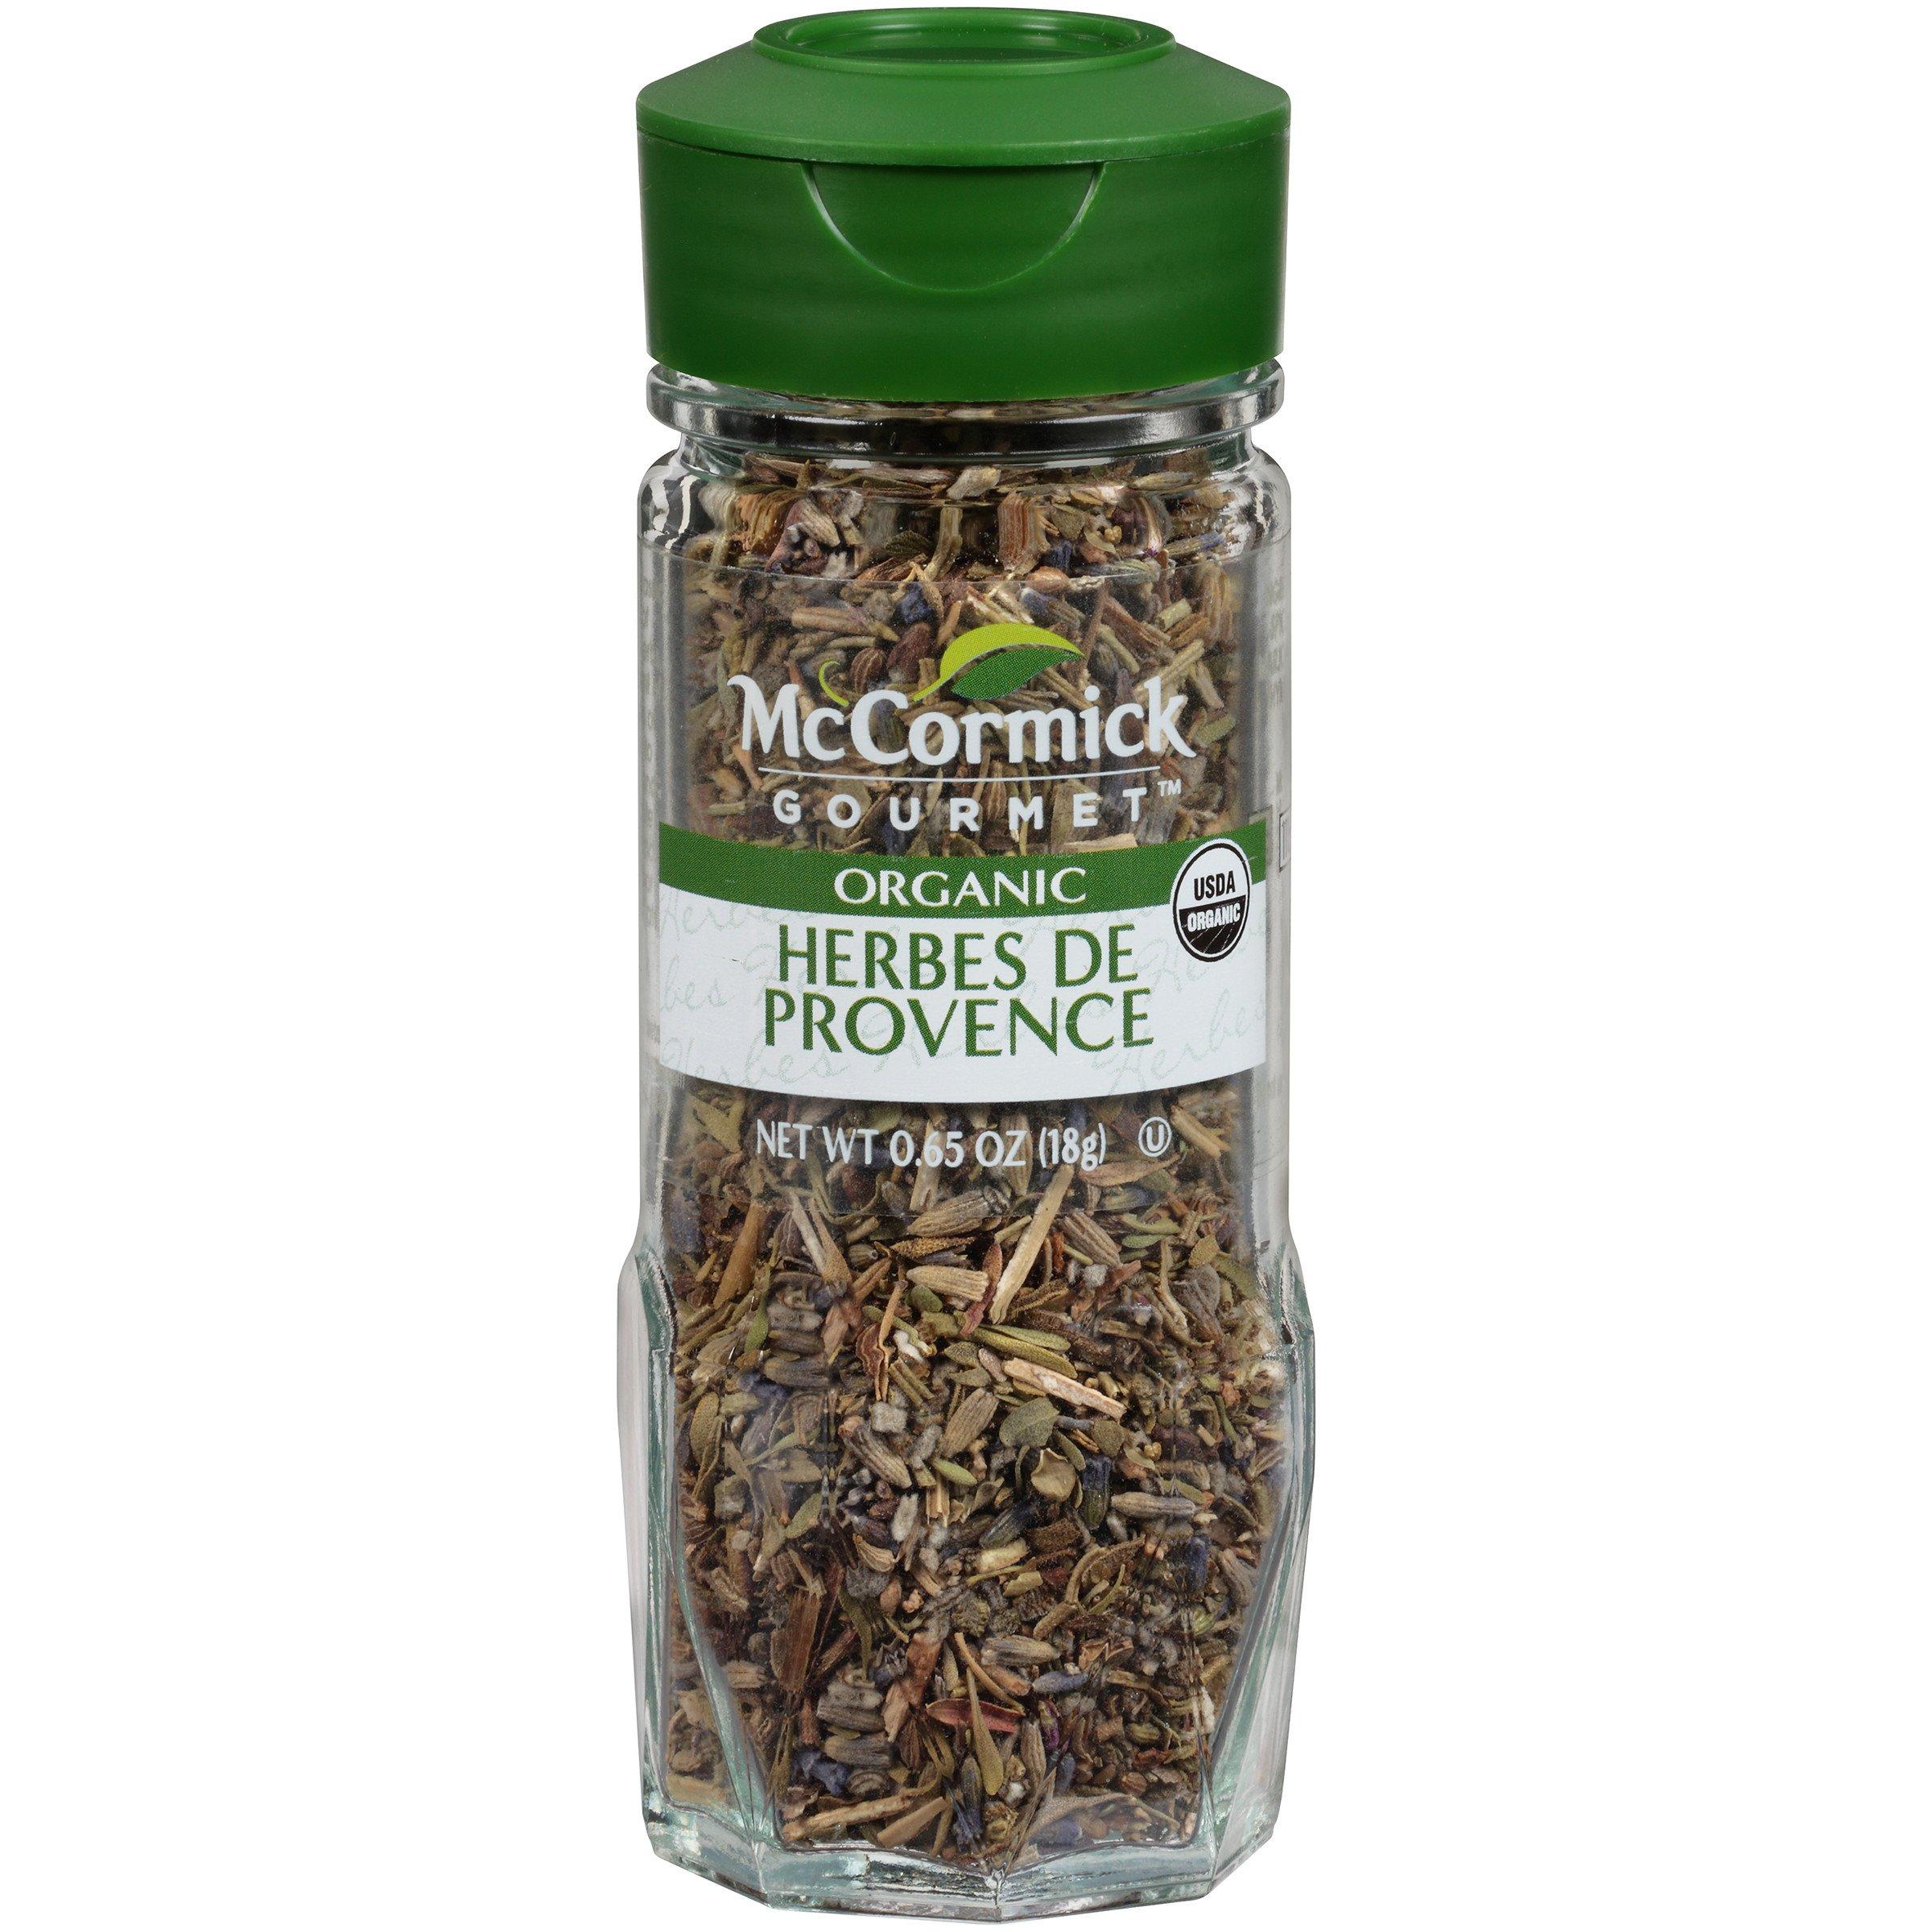 McCormick Gourmet Organic Herbes De Provence, 0.65 oz